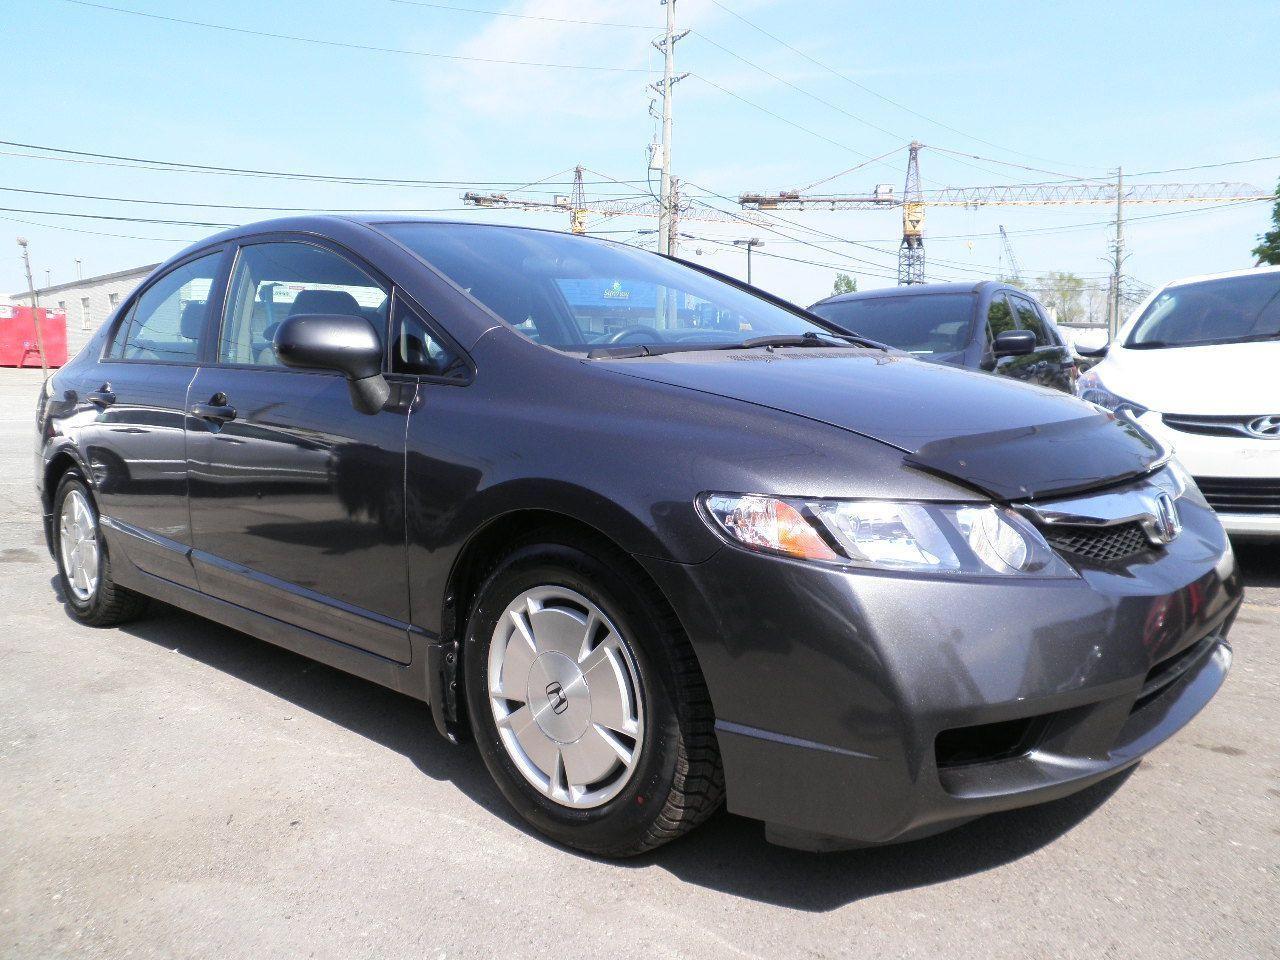 Photo of Gray 2009 Honda Civic